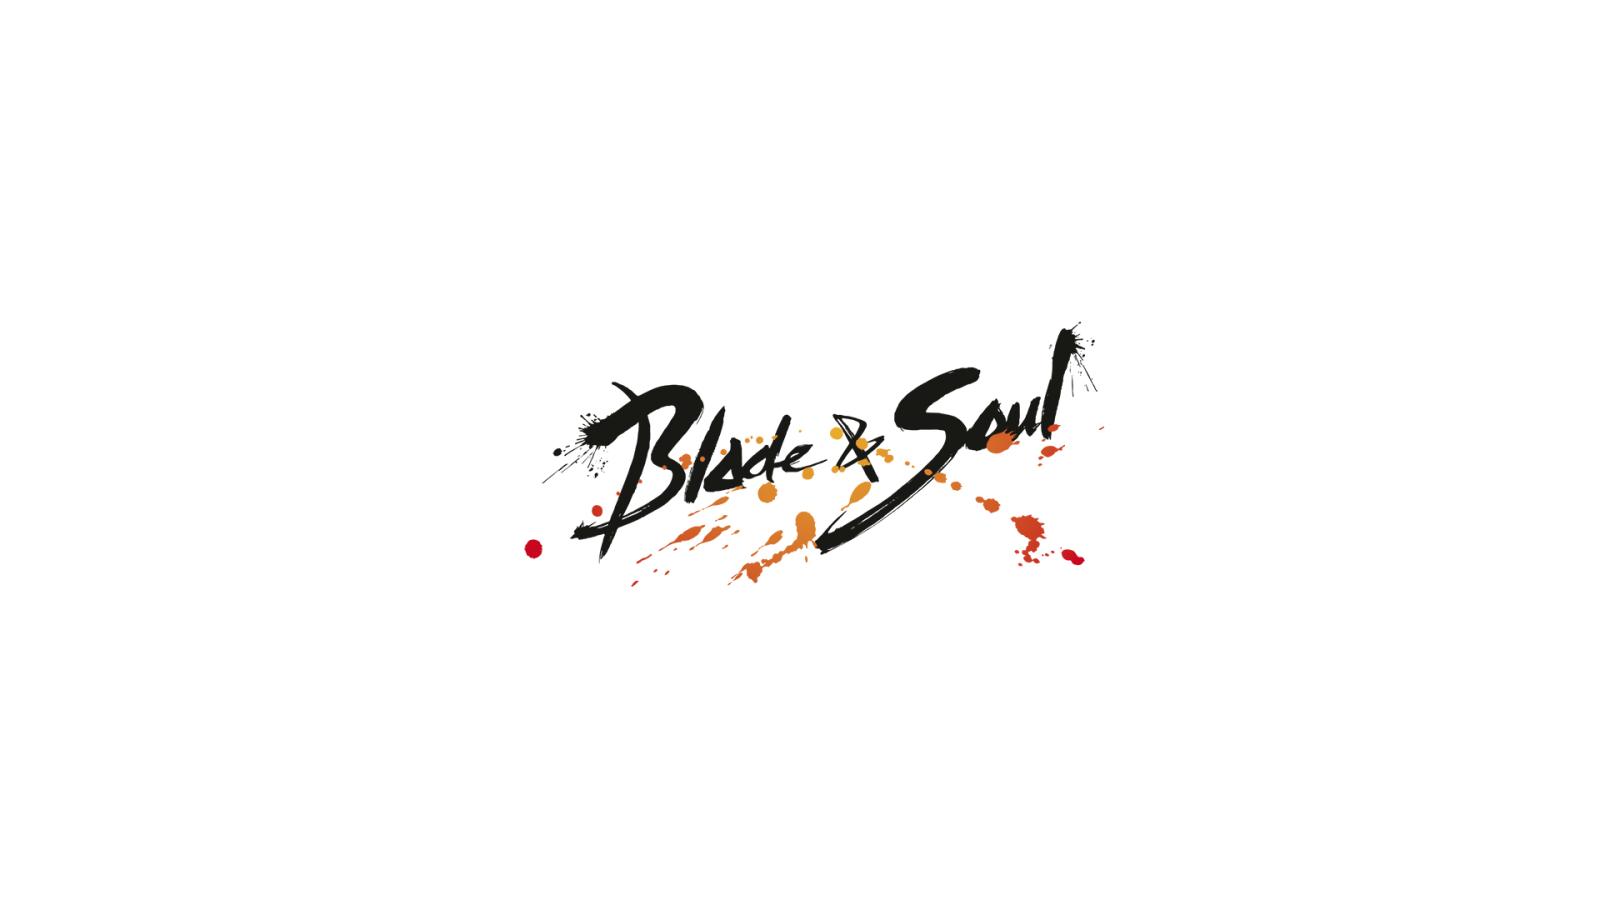 Blade & Soul - ремесла (крафт) - гайд-обзор